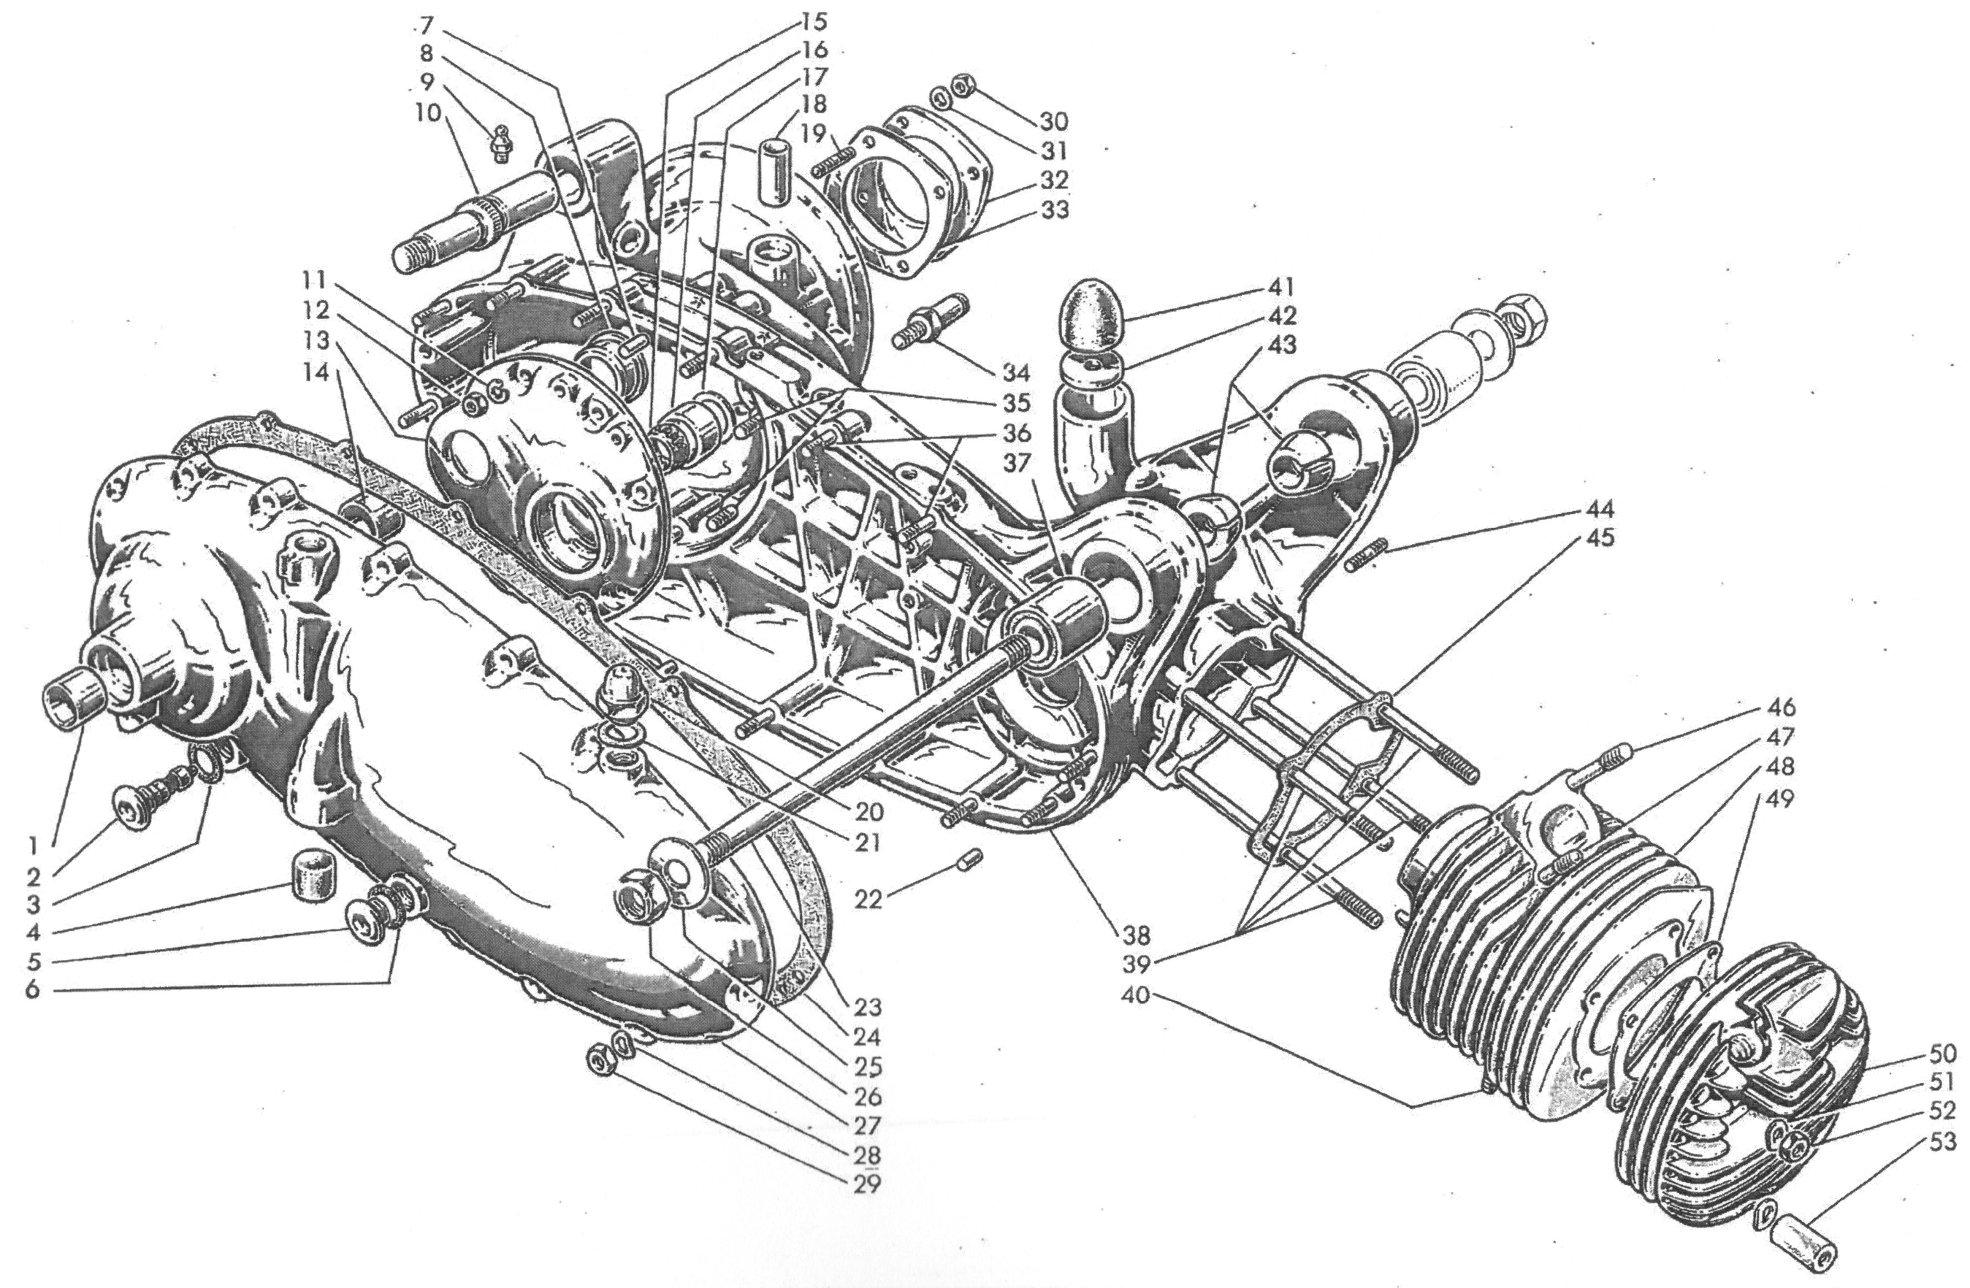 CARTER-MOTOR-CILINDRO